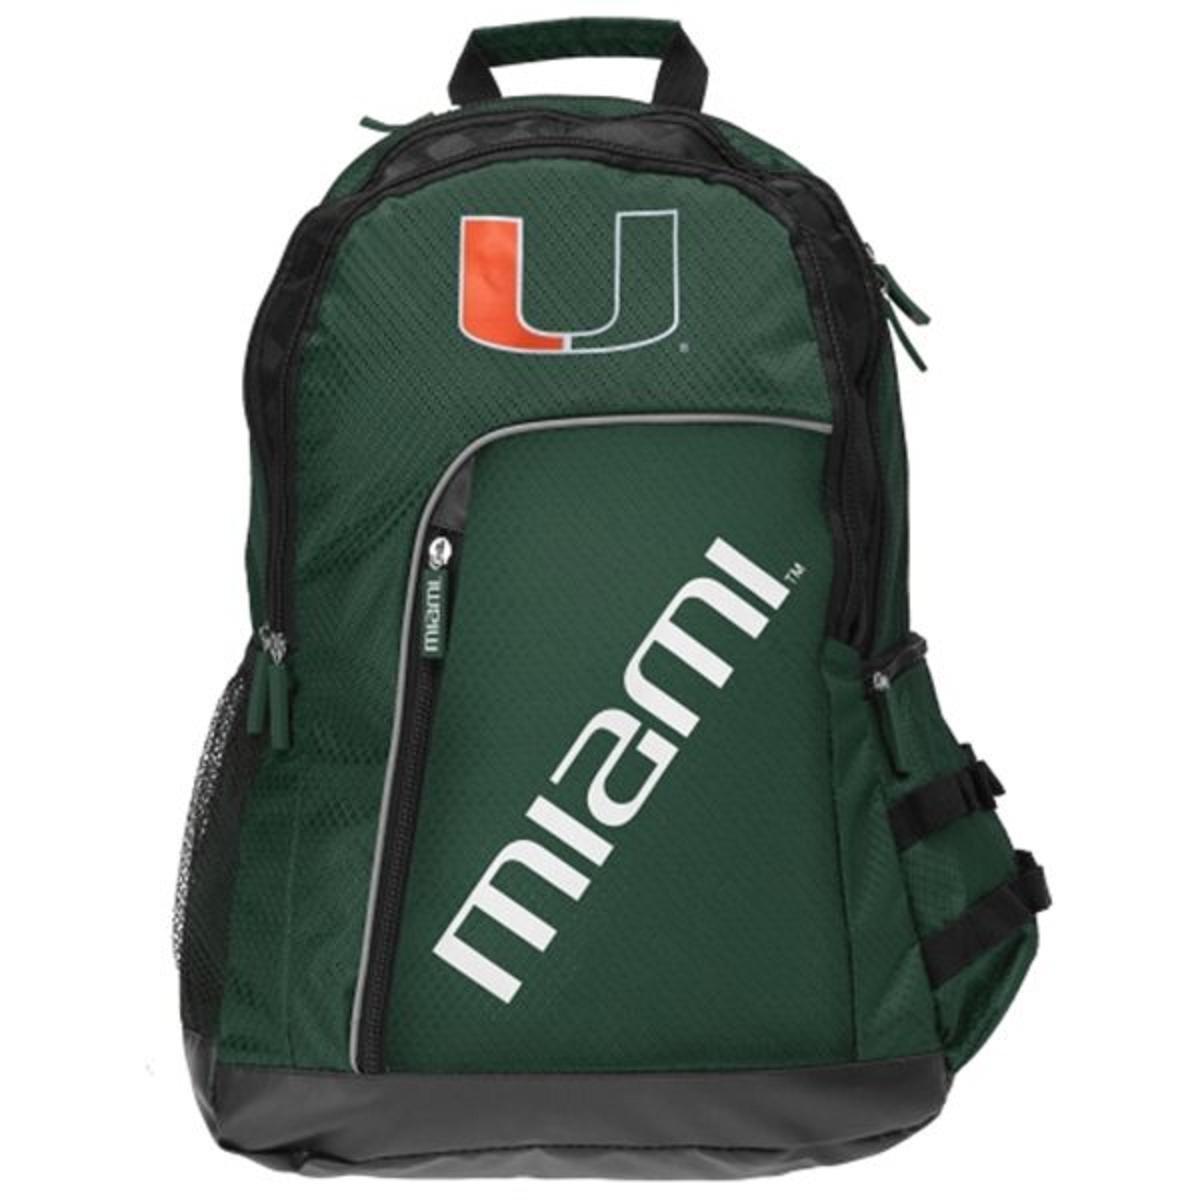 NCAA Miami Hurricanes 2014 Elite Backpack, Green, One Size